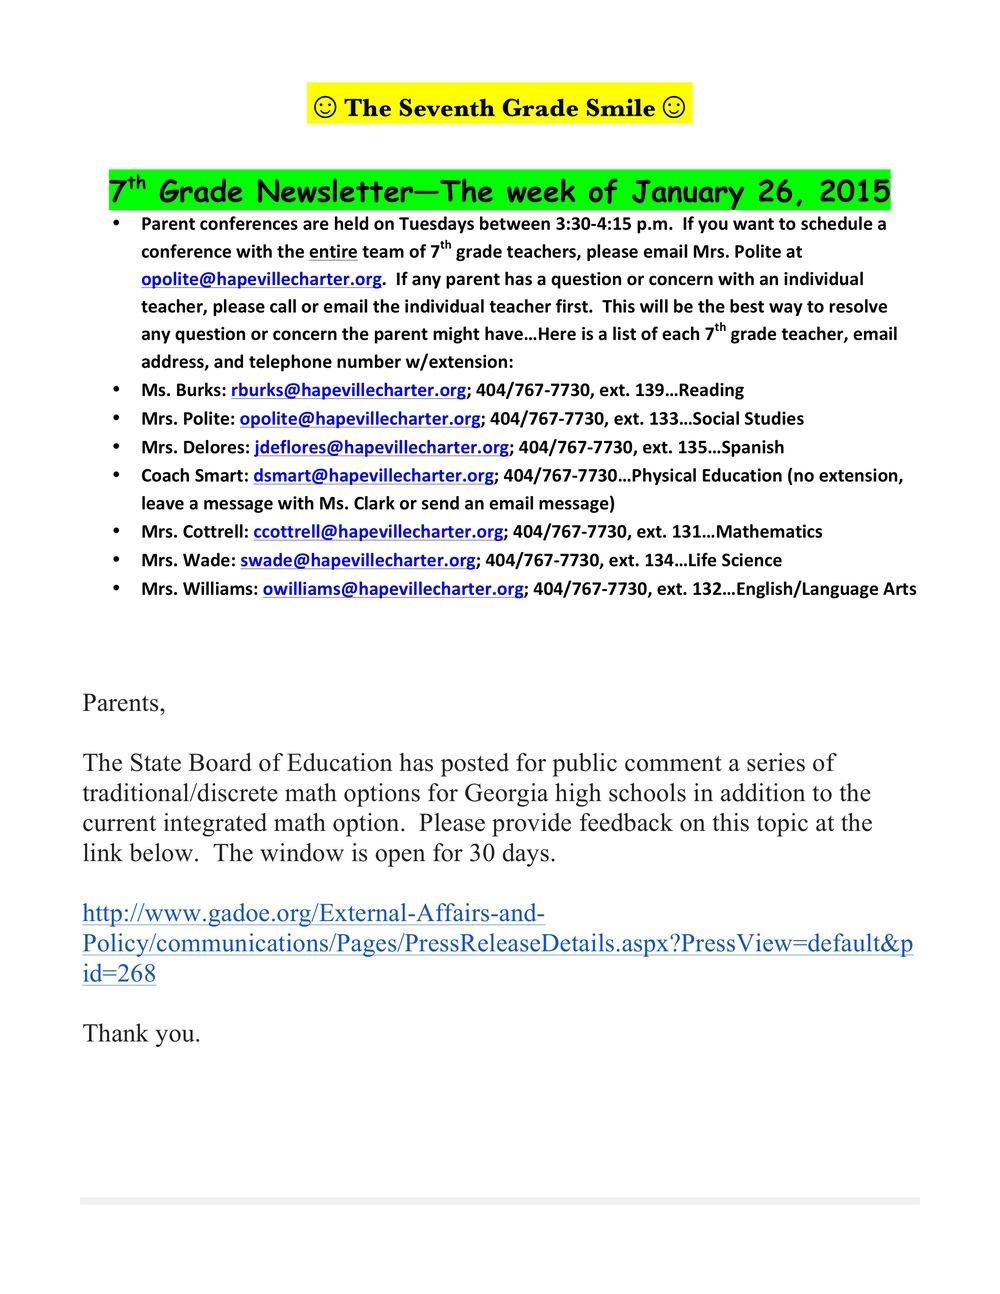 Newsletter Image7th grade January 26, 2015.jpeg